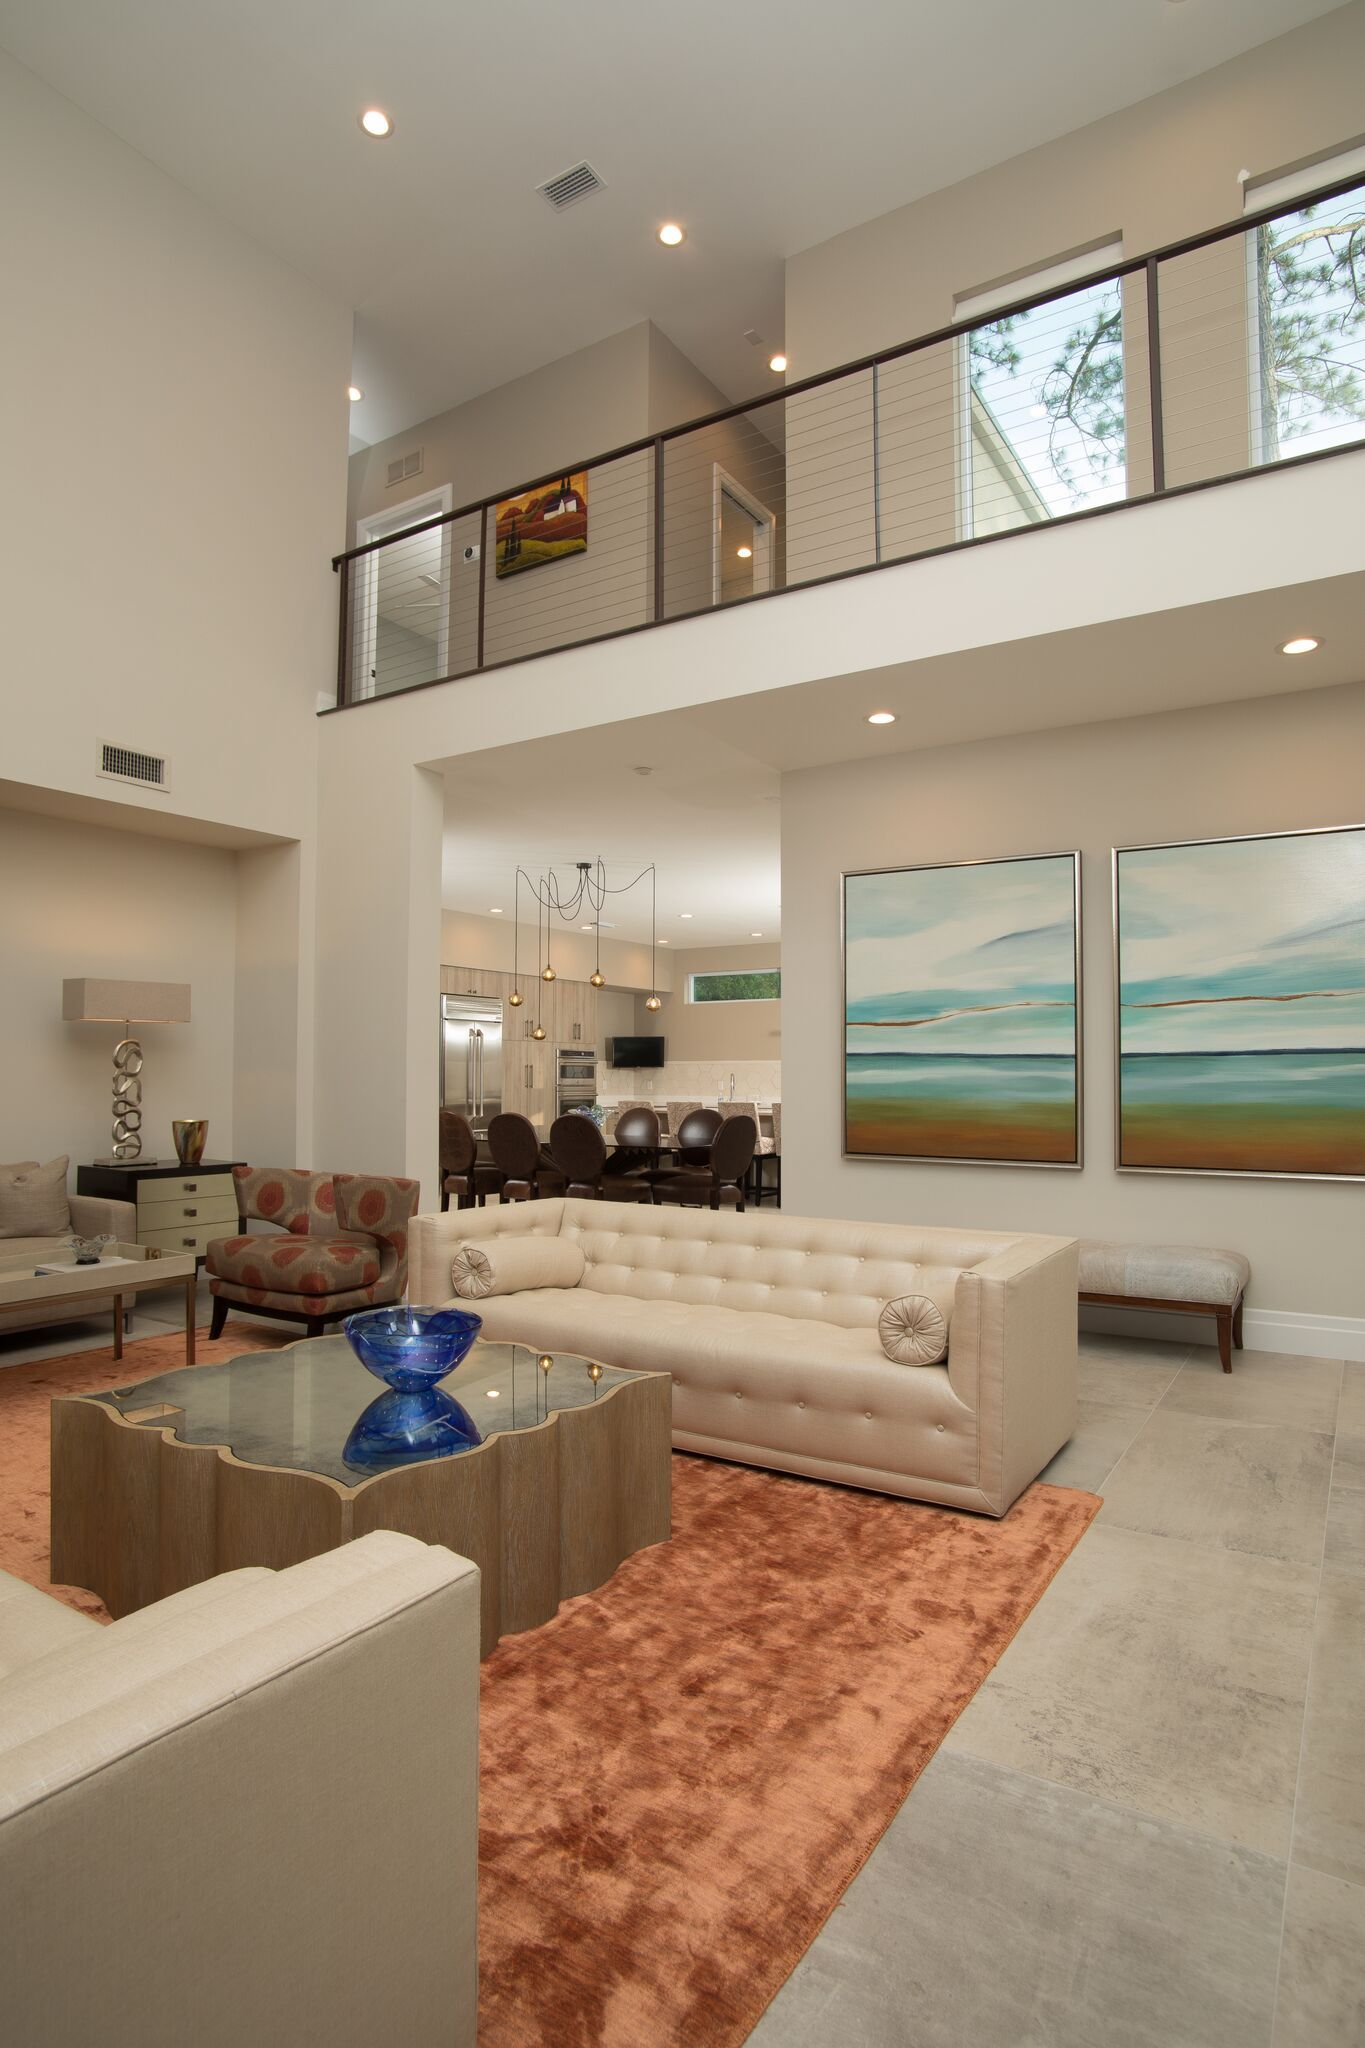 Antico Stone Floors Living Room Stone Flooring Living Room Florida Design Stone Flooring #stone #floors #living #room